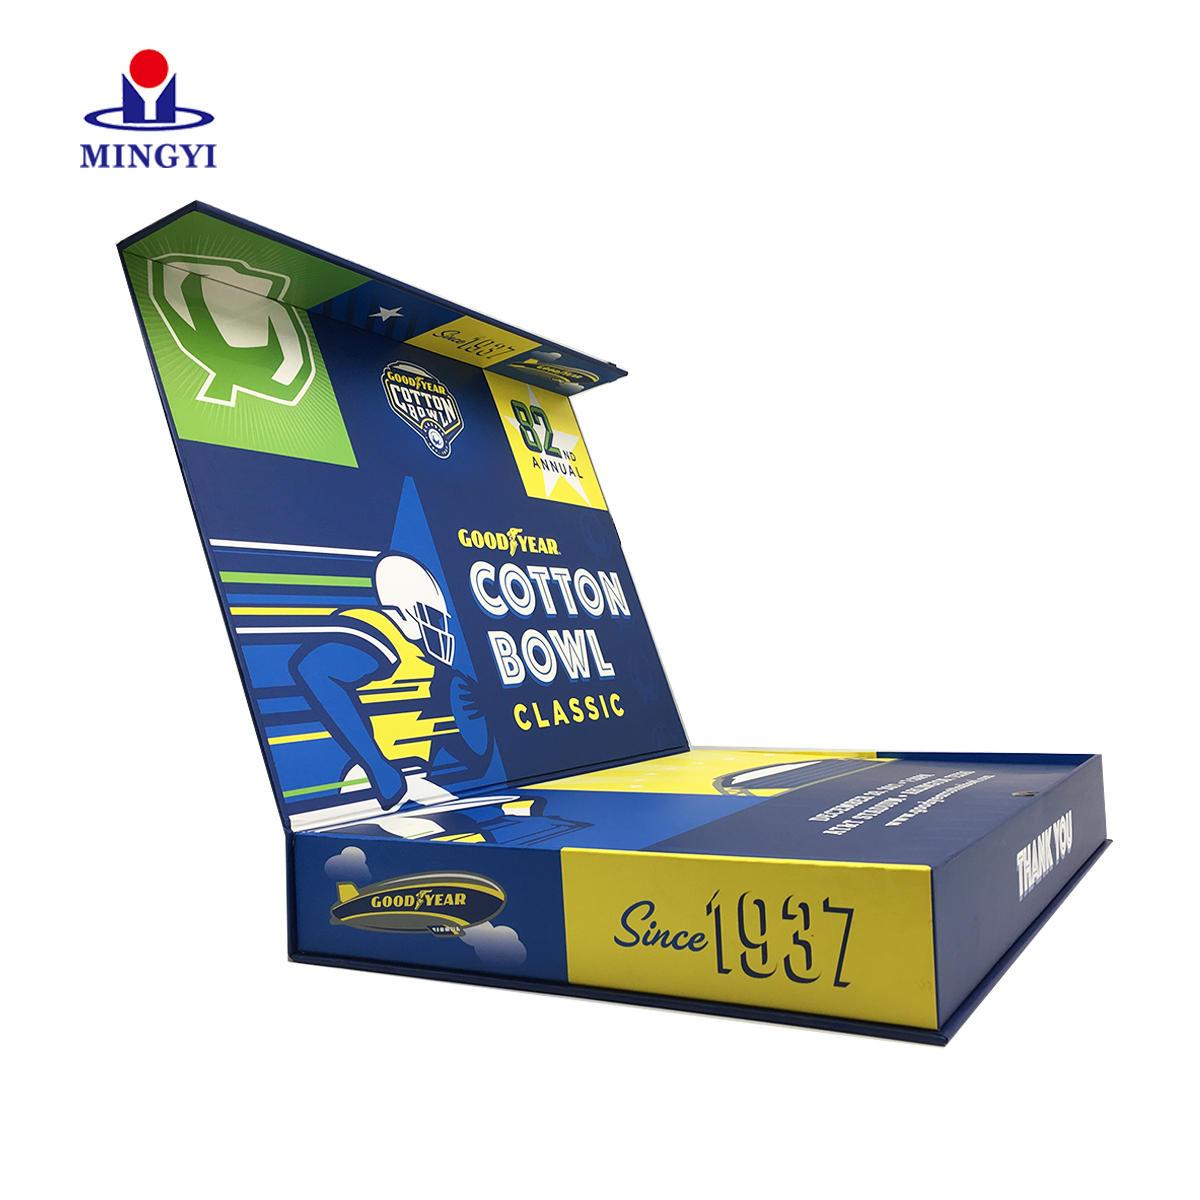 CUSTOM LUXURY PRINTED LAMINATION MAGNETIC DISPLAY REYCLED HANDMADE CARDBOARD GIFT PAPER BOX WHOLESALE